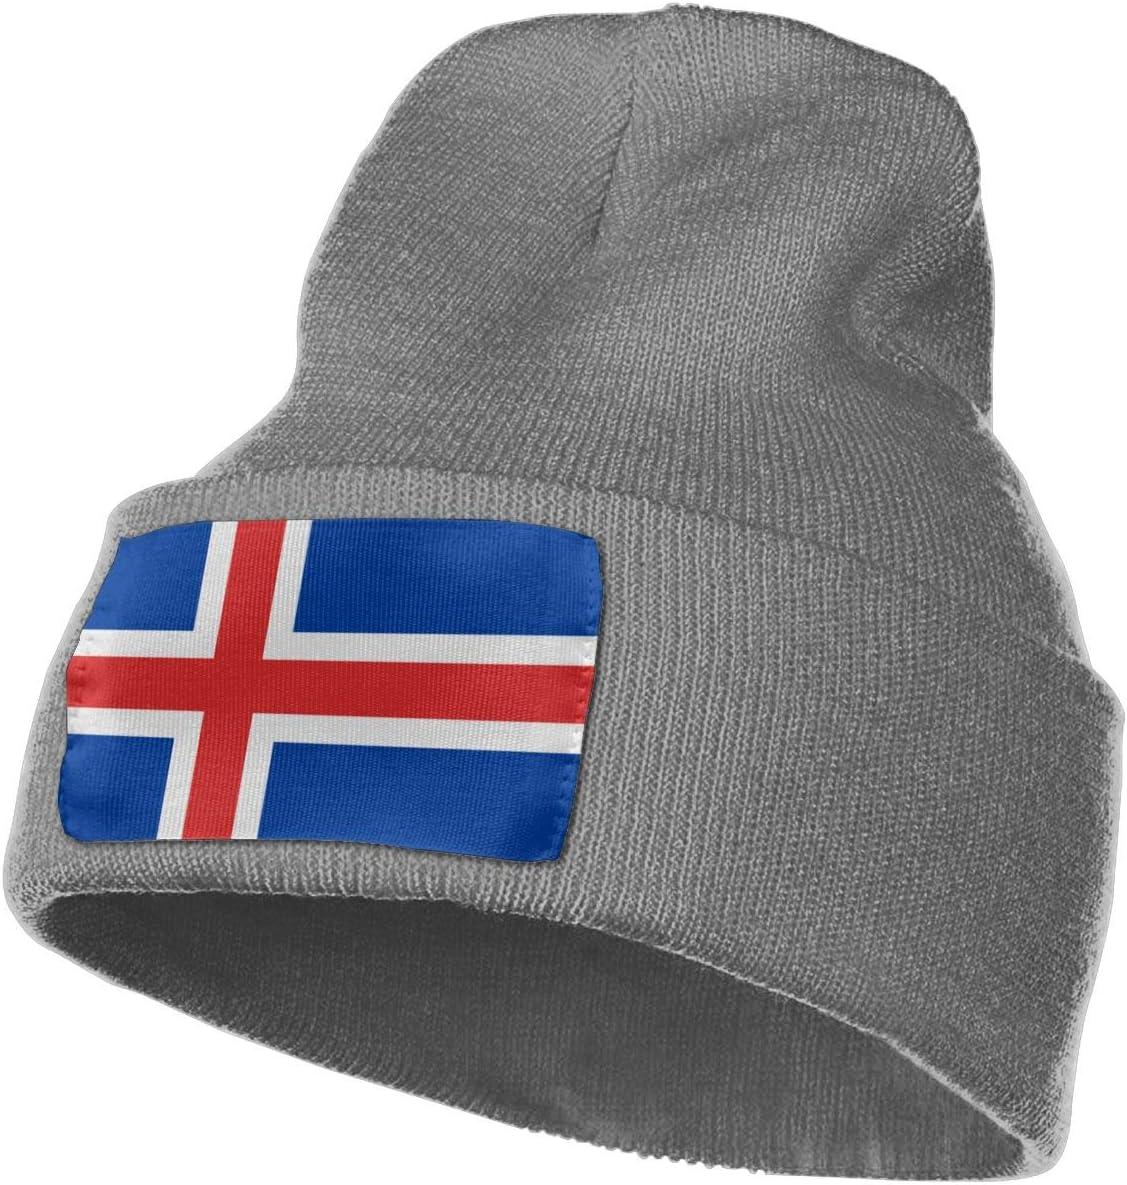 Warm /& Stylish Winter Hats Black MACA Iceland Unisex Slouch Beanie Hats Thick